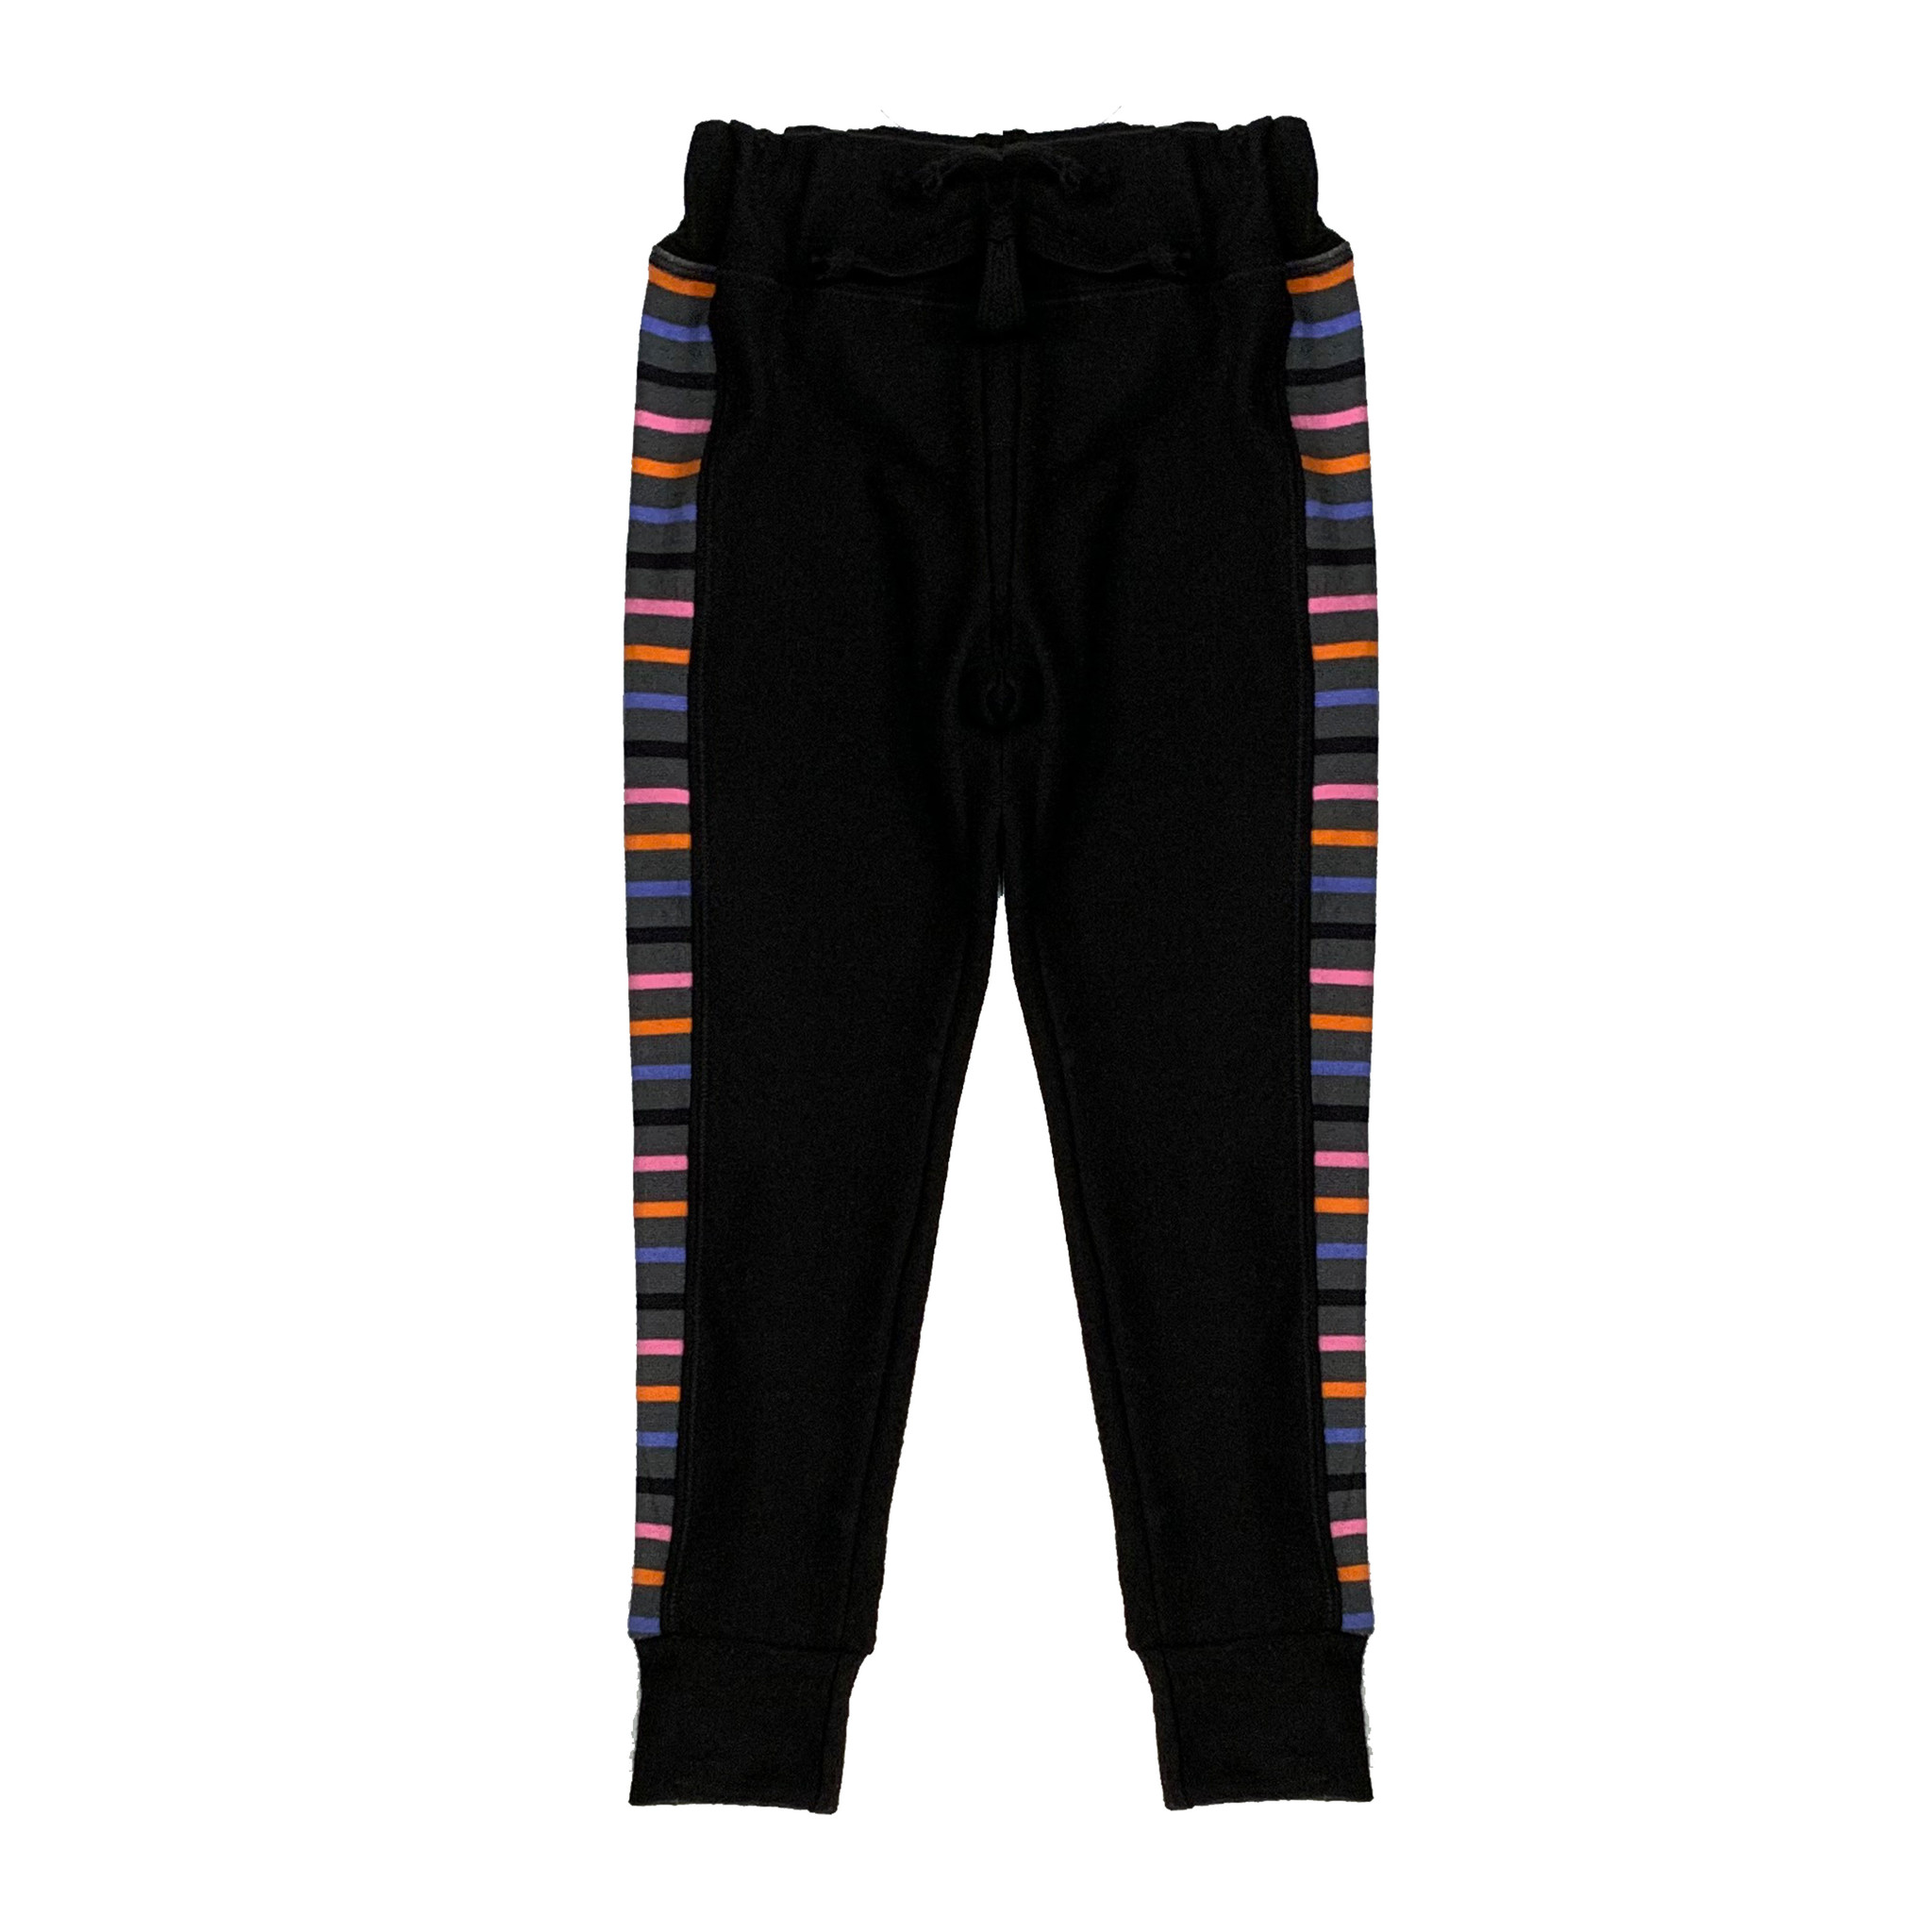 T2Love Striped Panel Skinny Pant